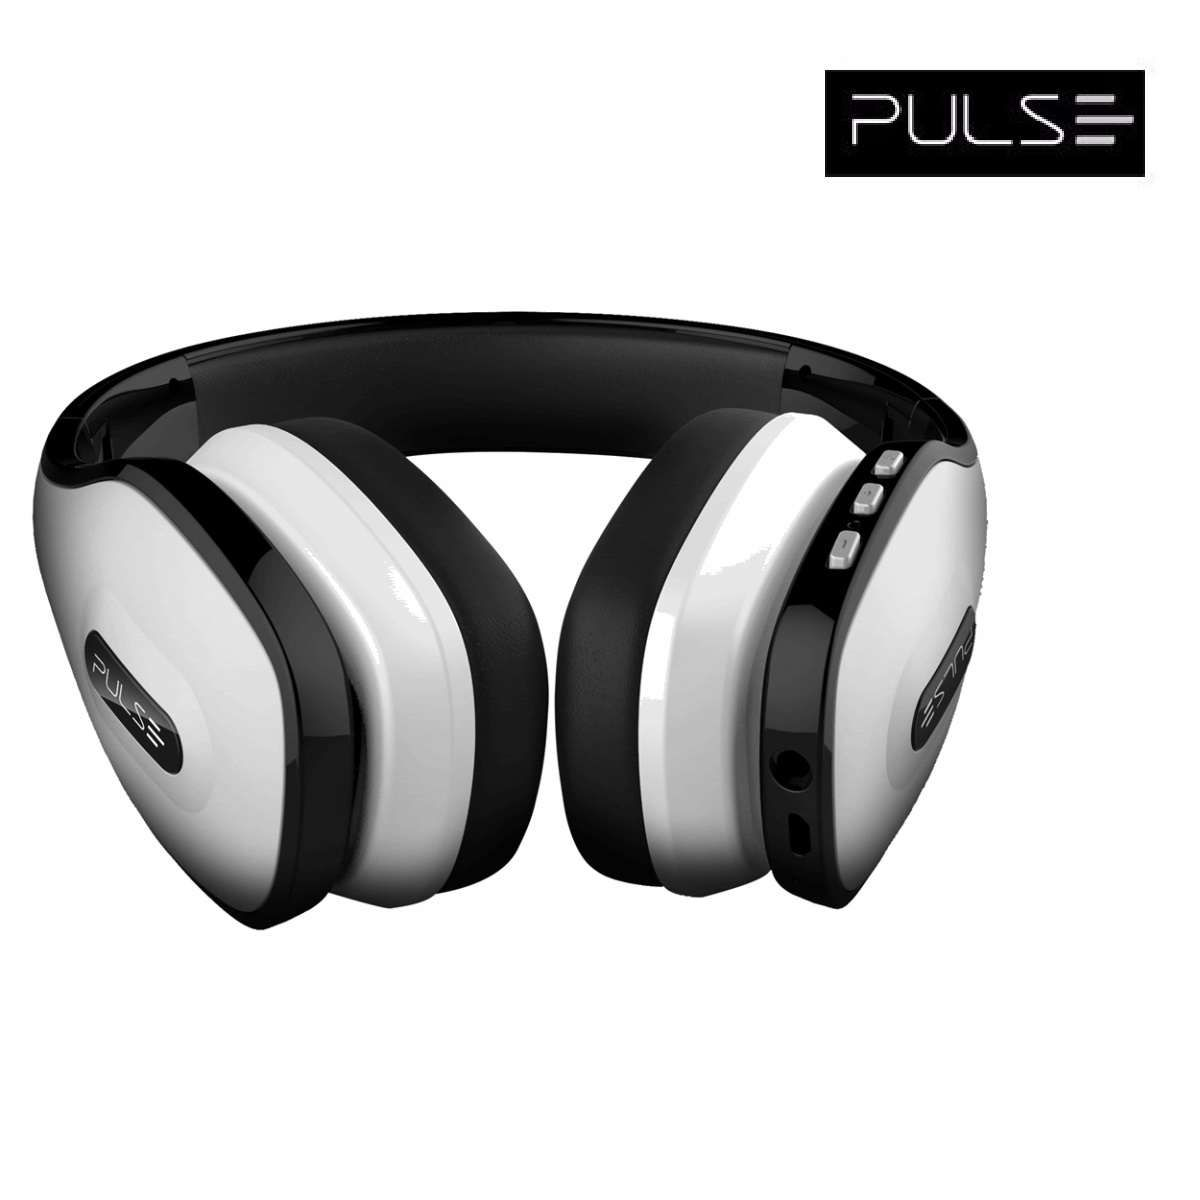 Headphone Multilaser com Microfone Pulse Over Ear Hands Free PH149 Branco